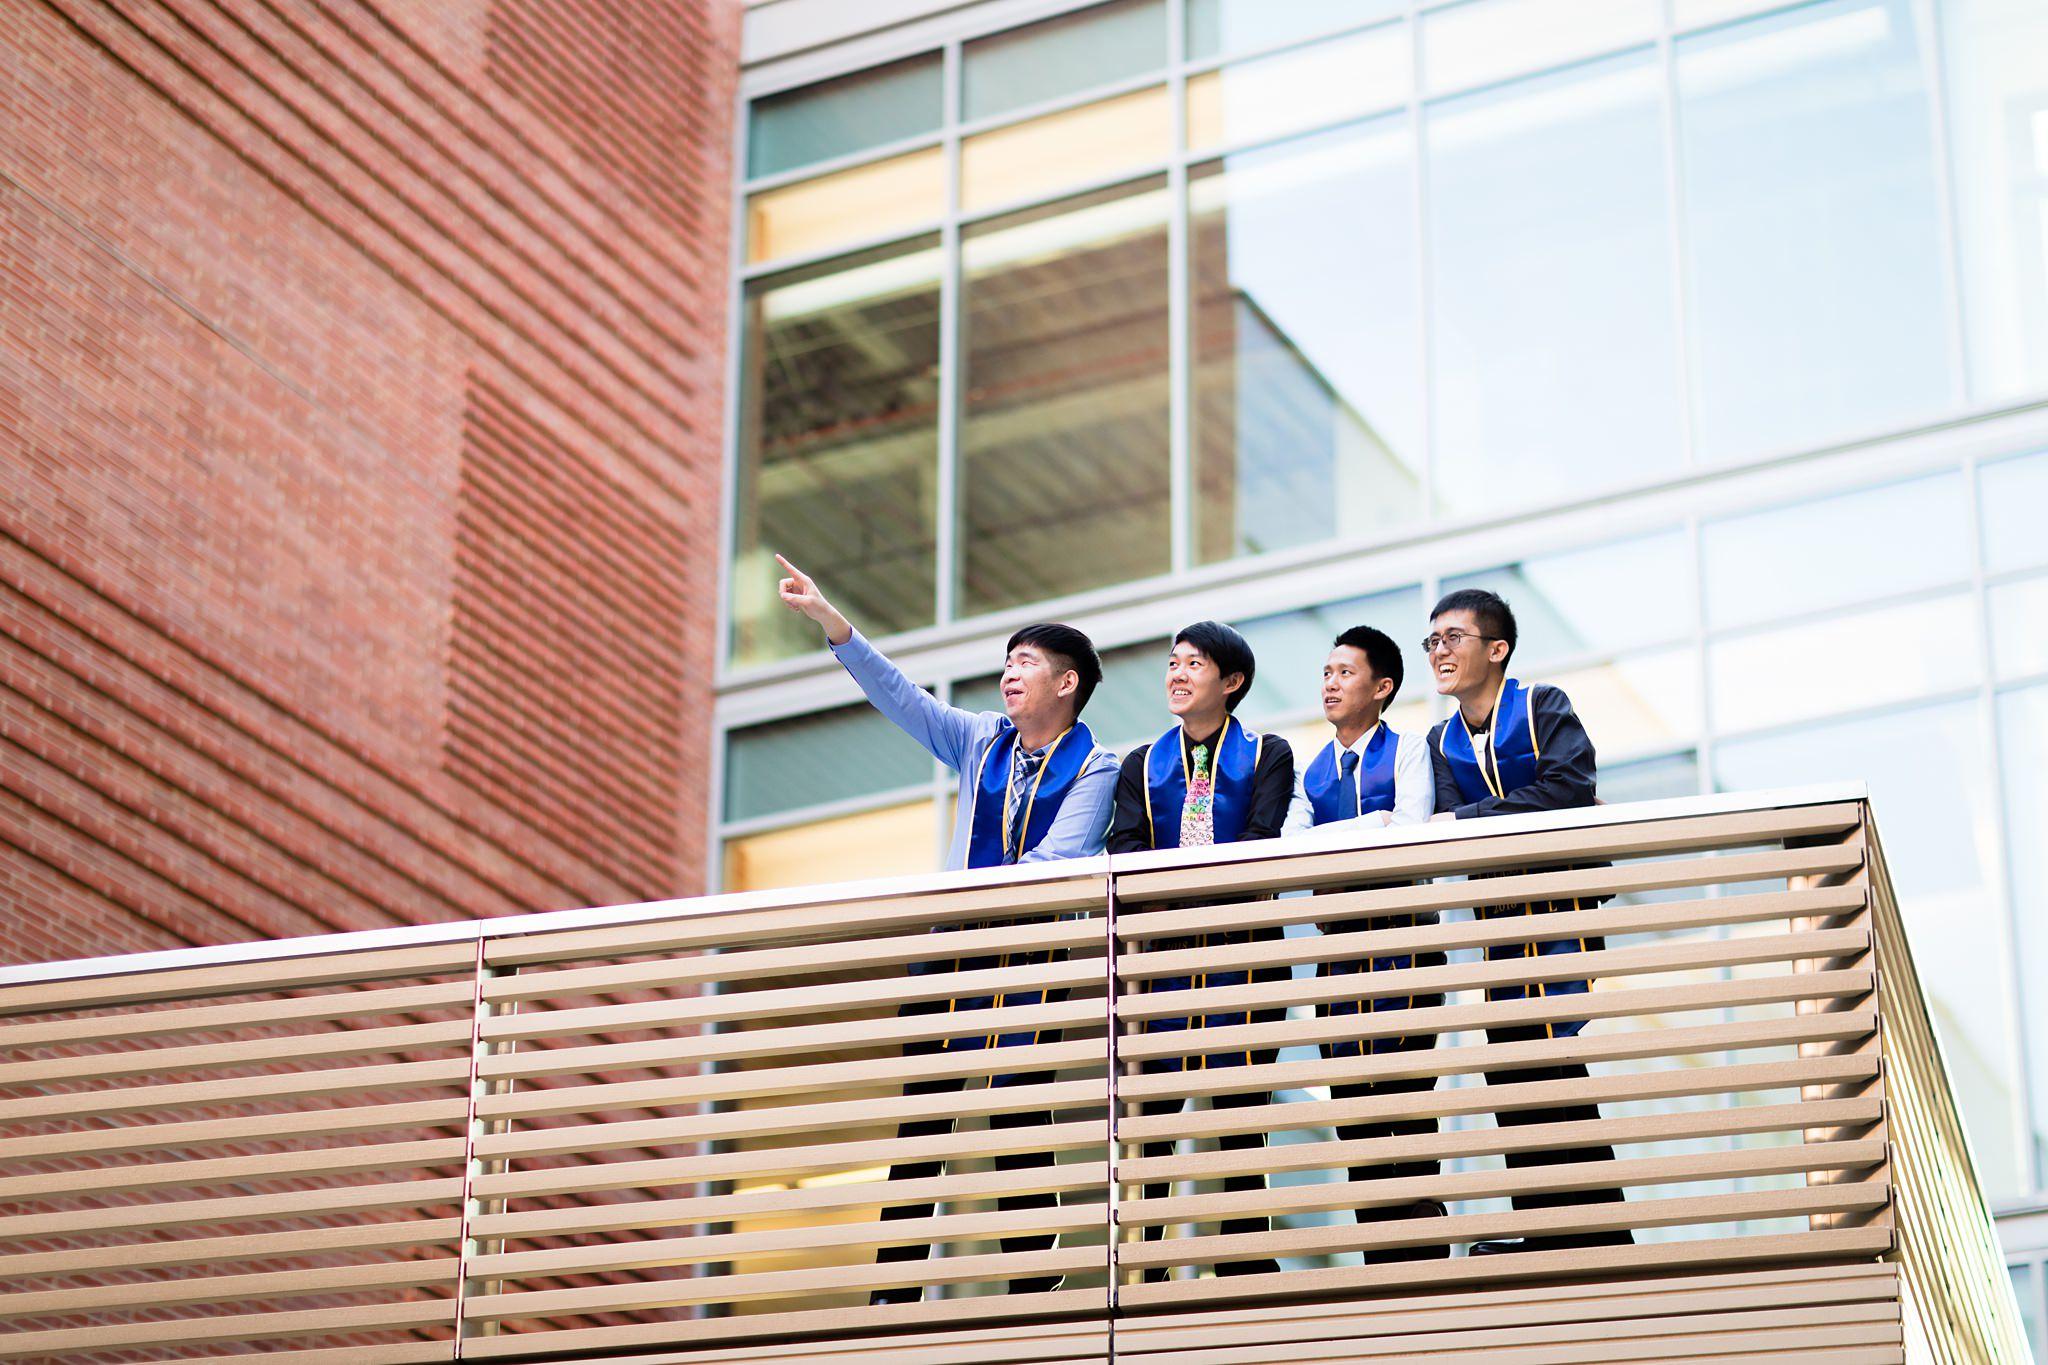 los-angeles-ucla-senior-graduation-portraits-epic-environmental-candid-laughing-friends